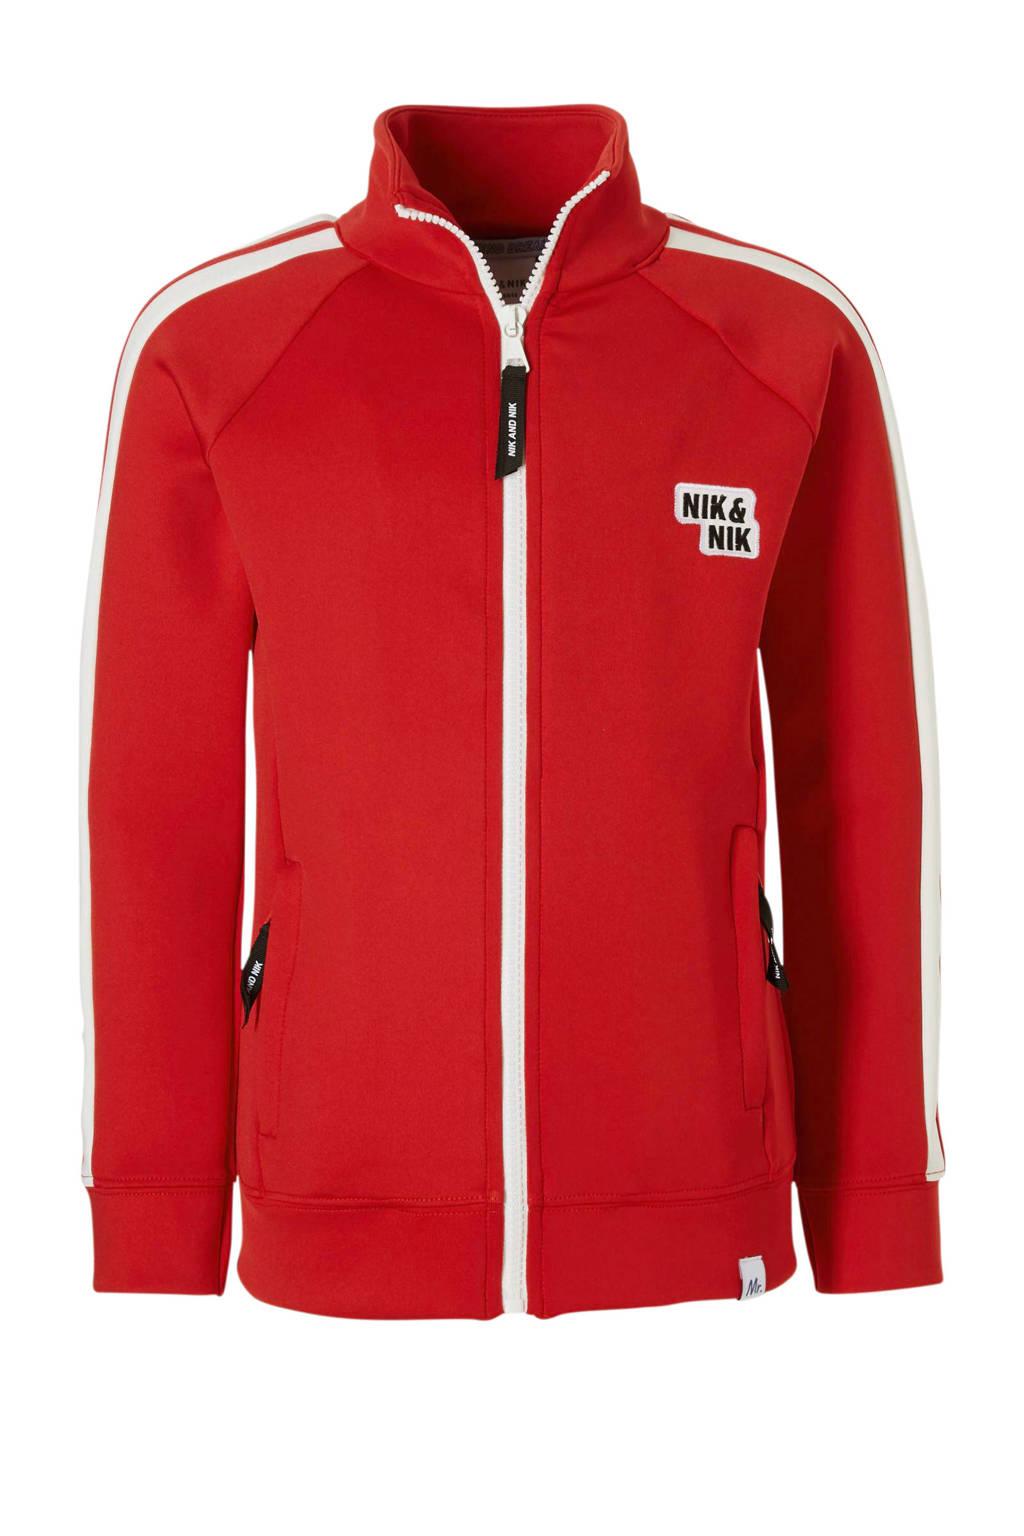 NIK&NIK trainingsvest met contrastbies Mark rood, Rood/wit